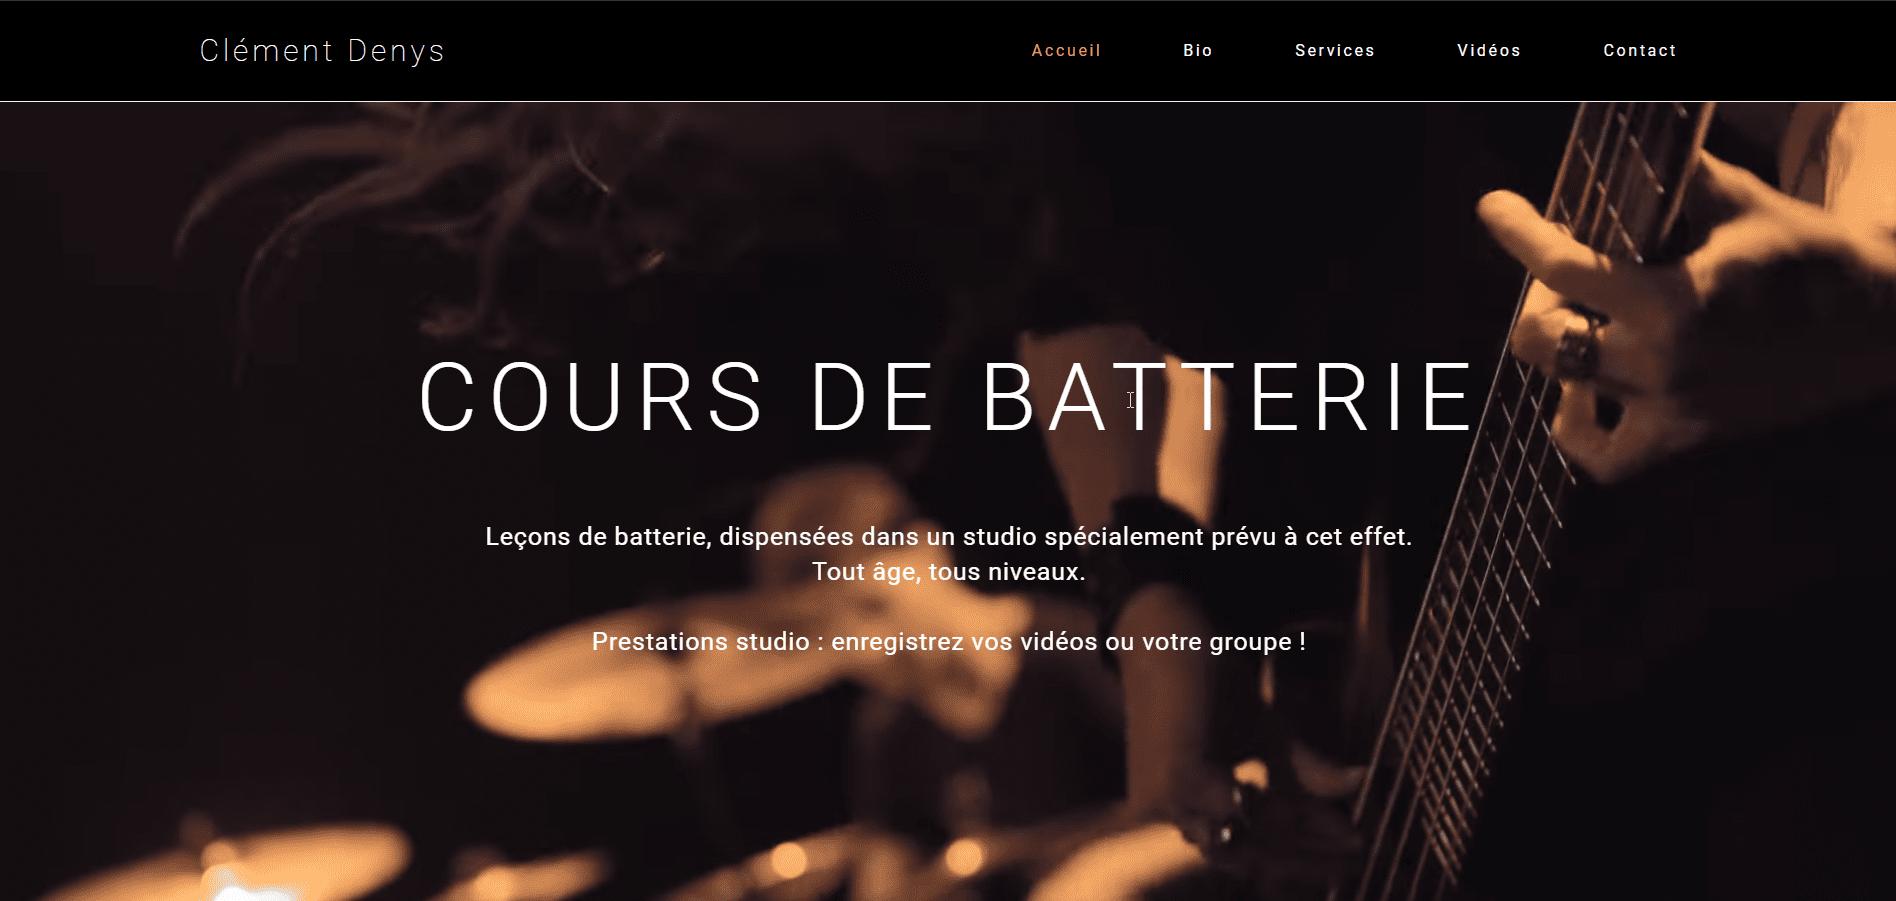 Clement Denys website